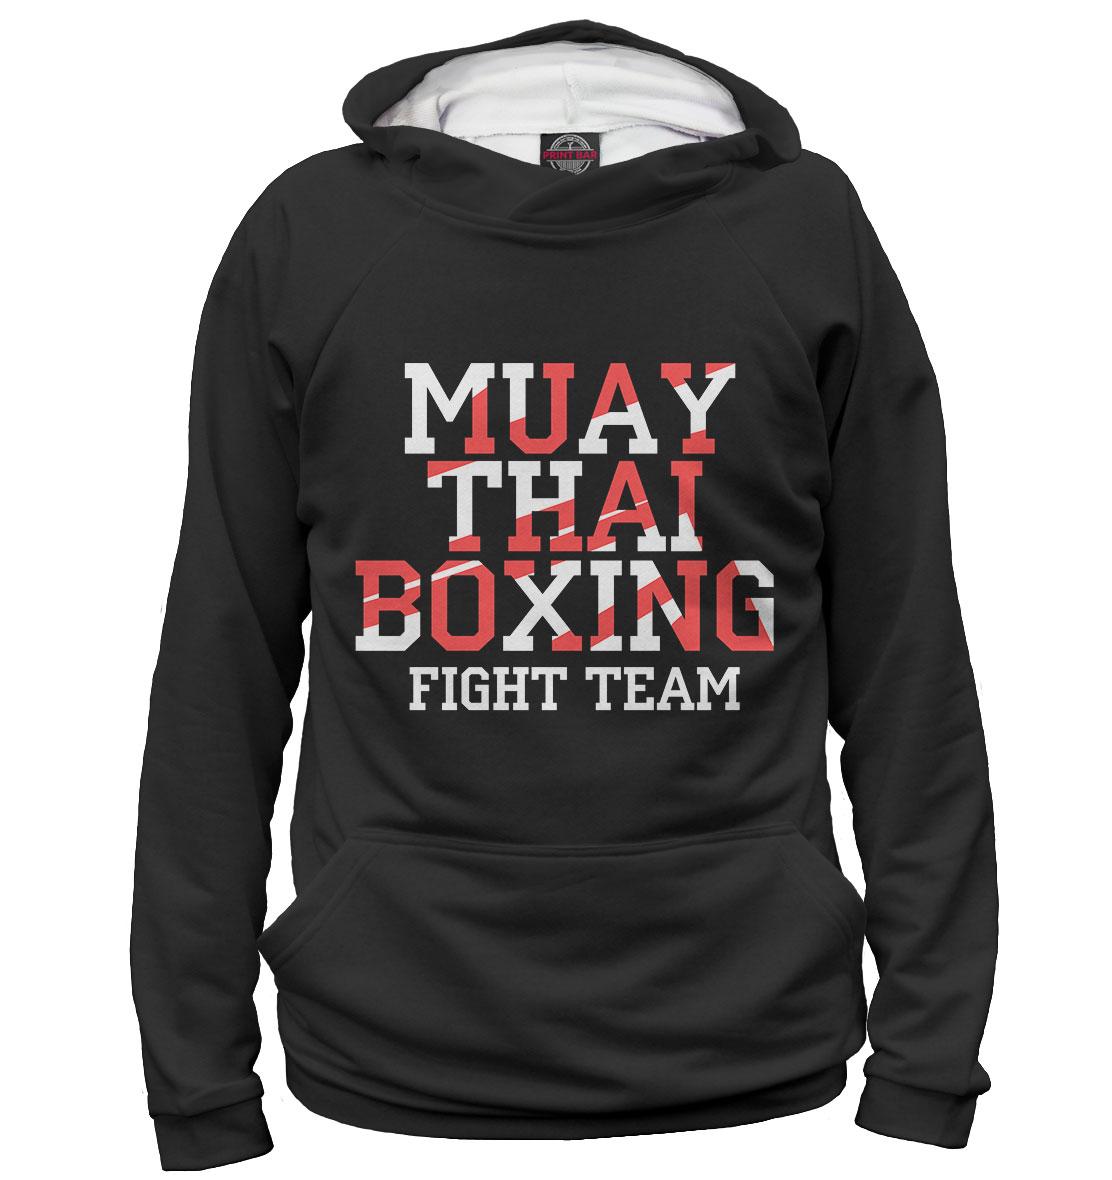 Купить Muay Thai Boxing, Printbar, Худи, EDI-540894-hud-1